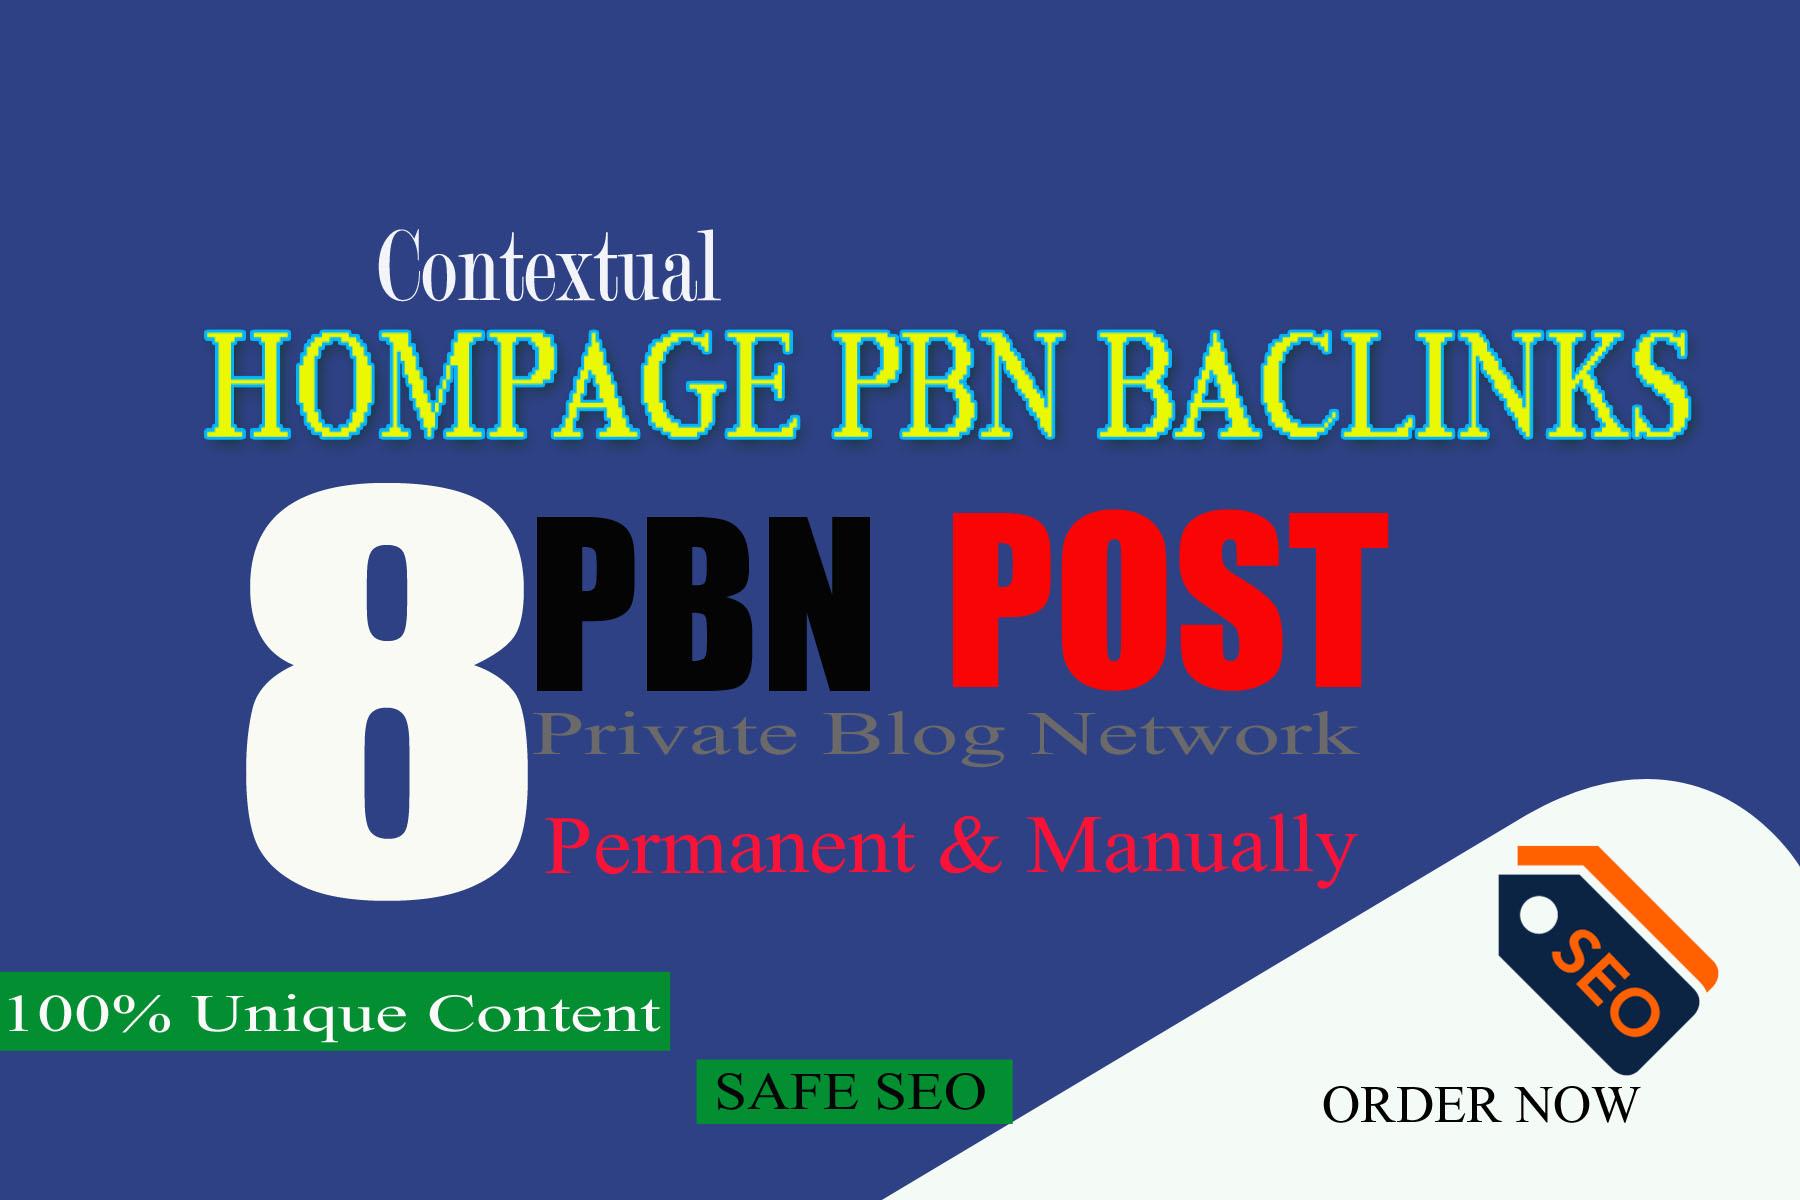 Manually 12 High Tf Cf Permanent Hompage Pbn Backlinks